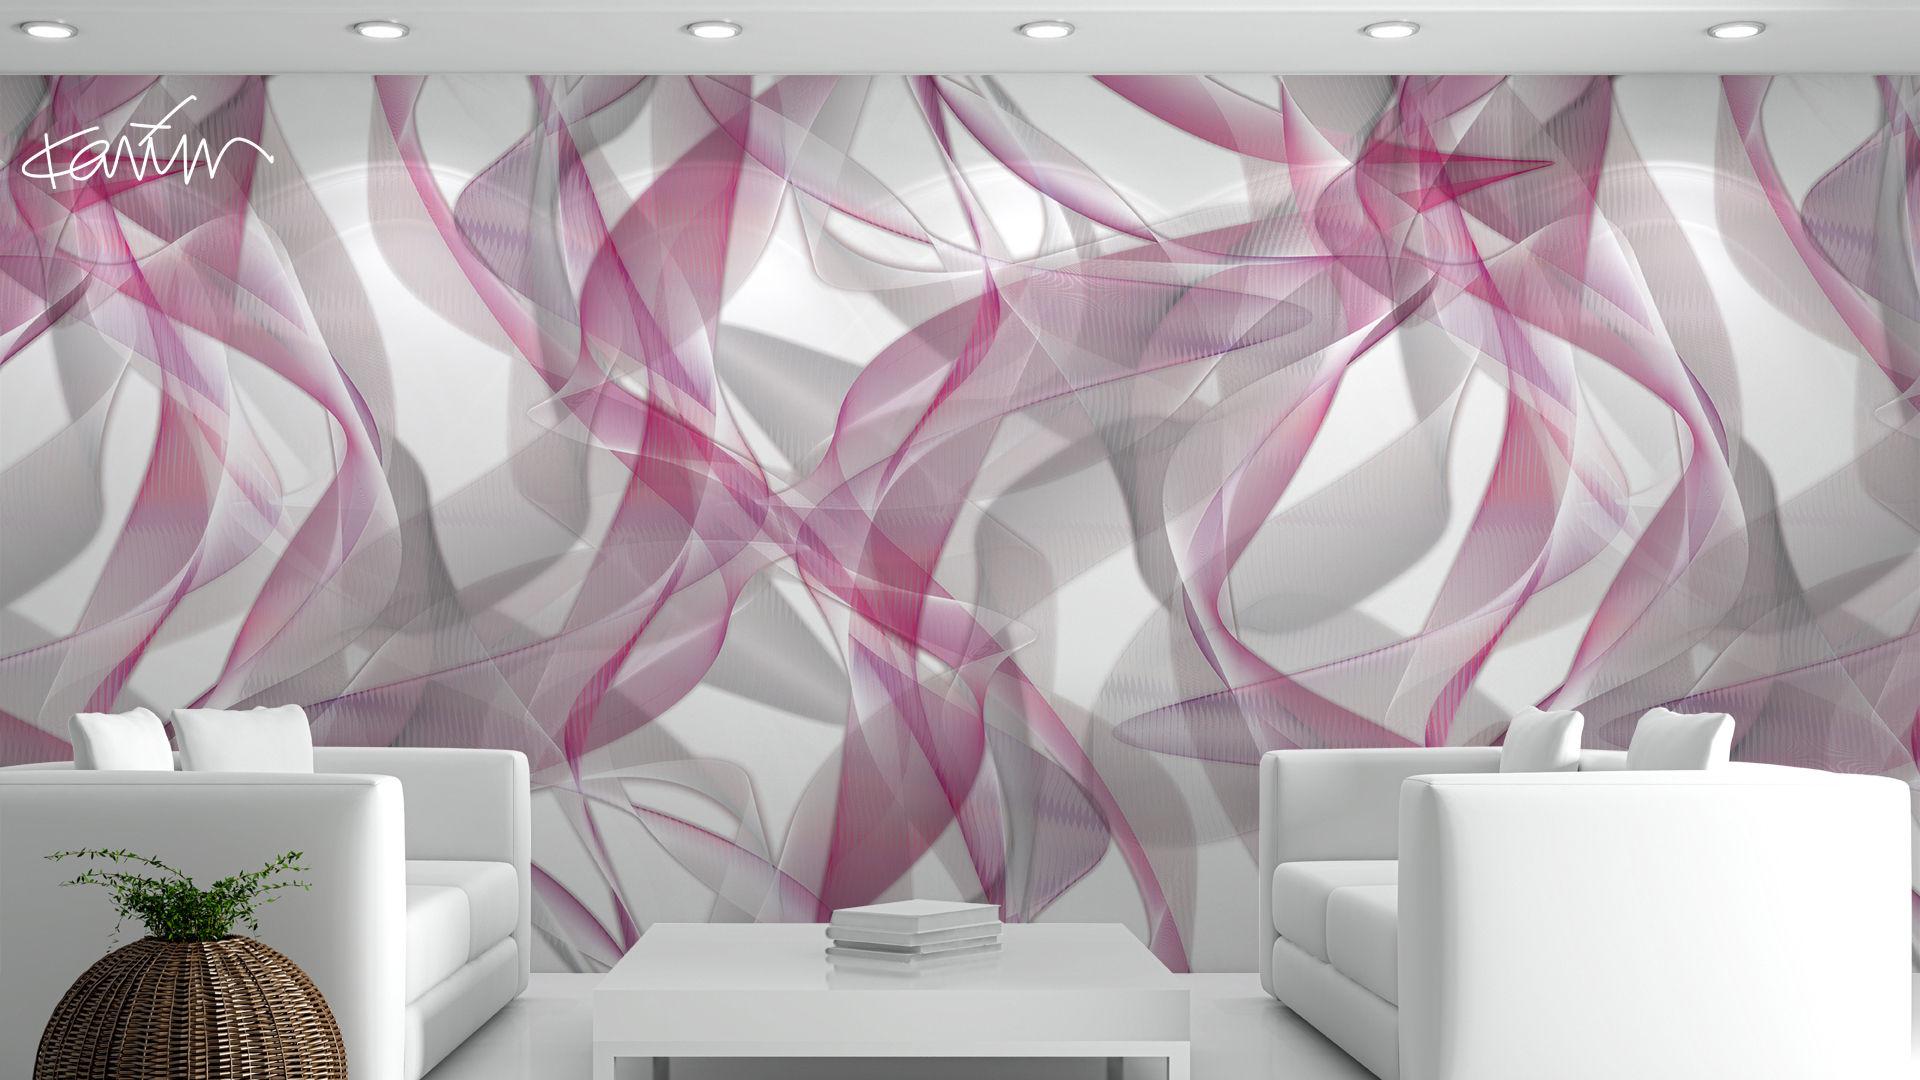 Karim Rashid Wallpaper Karim Rashid Wallpaper Texture